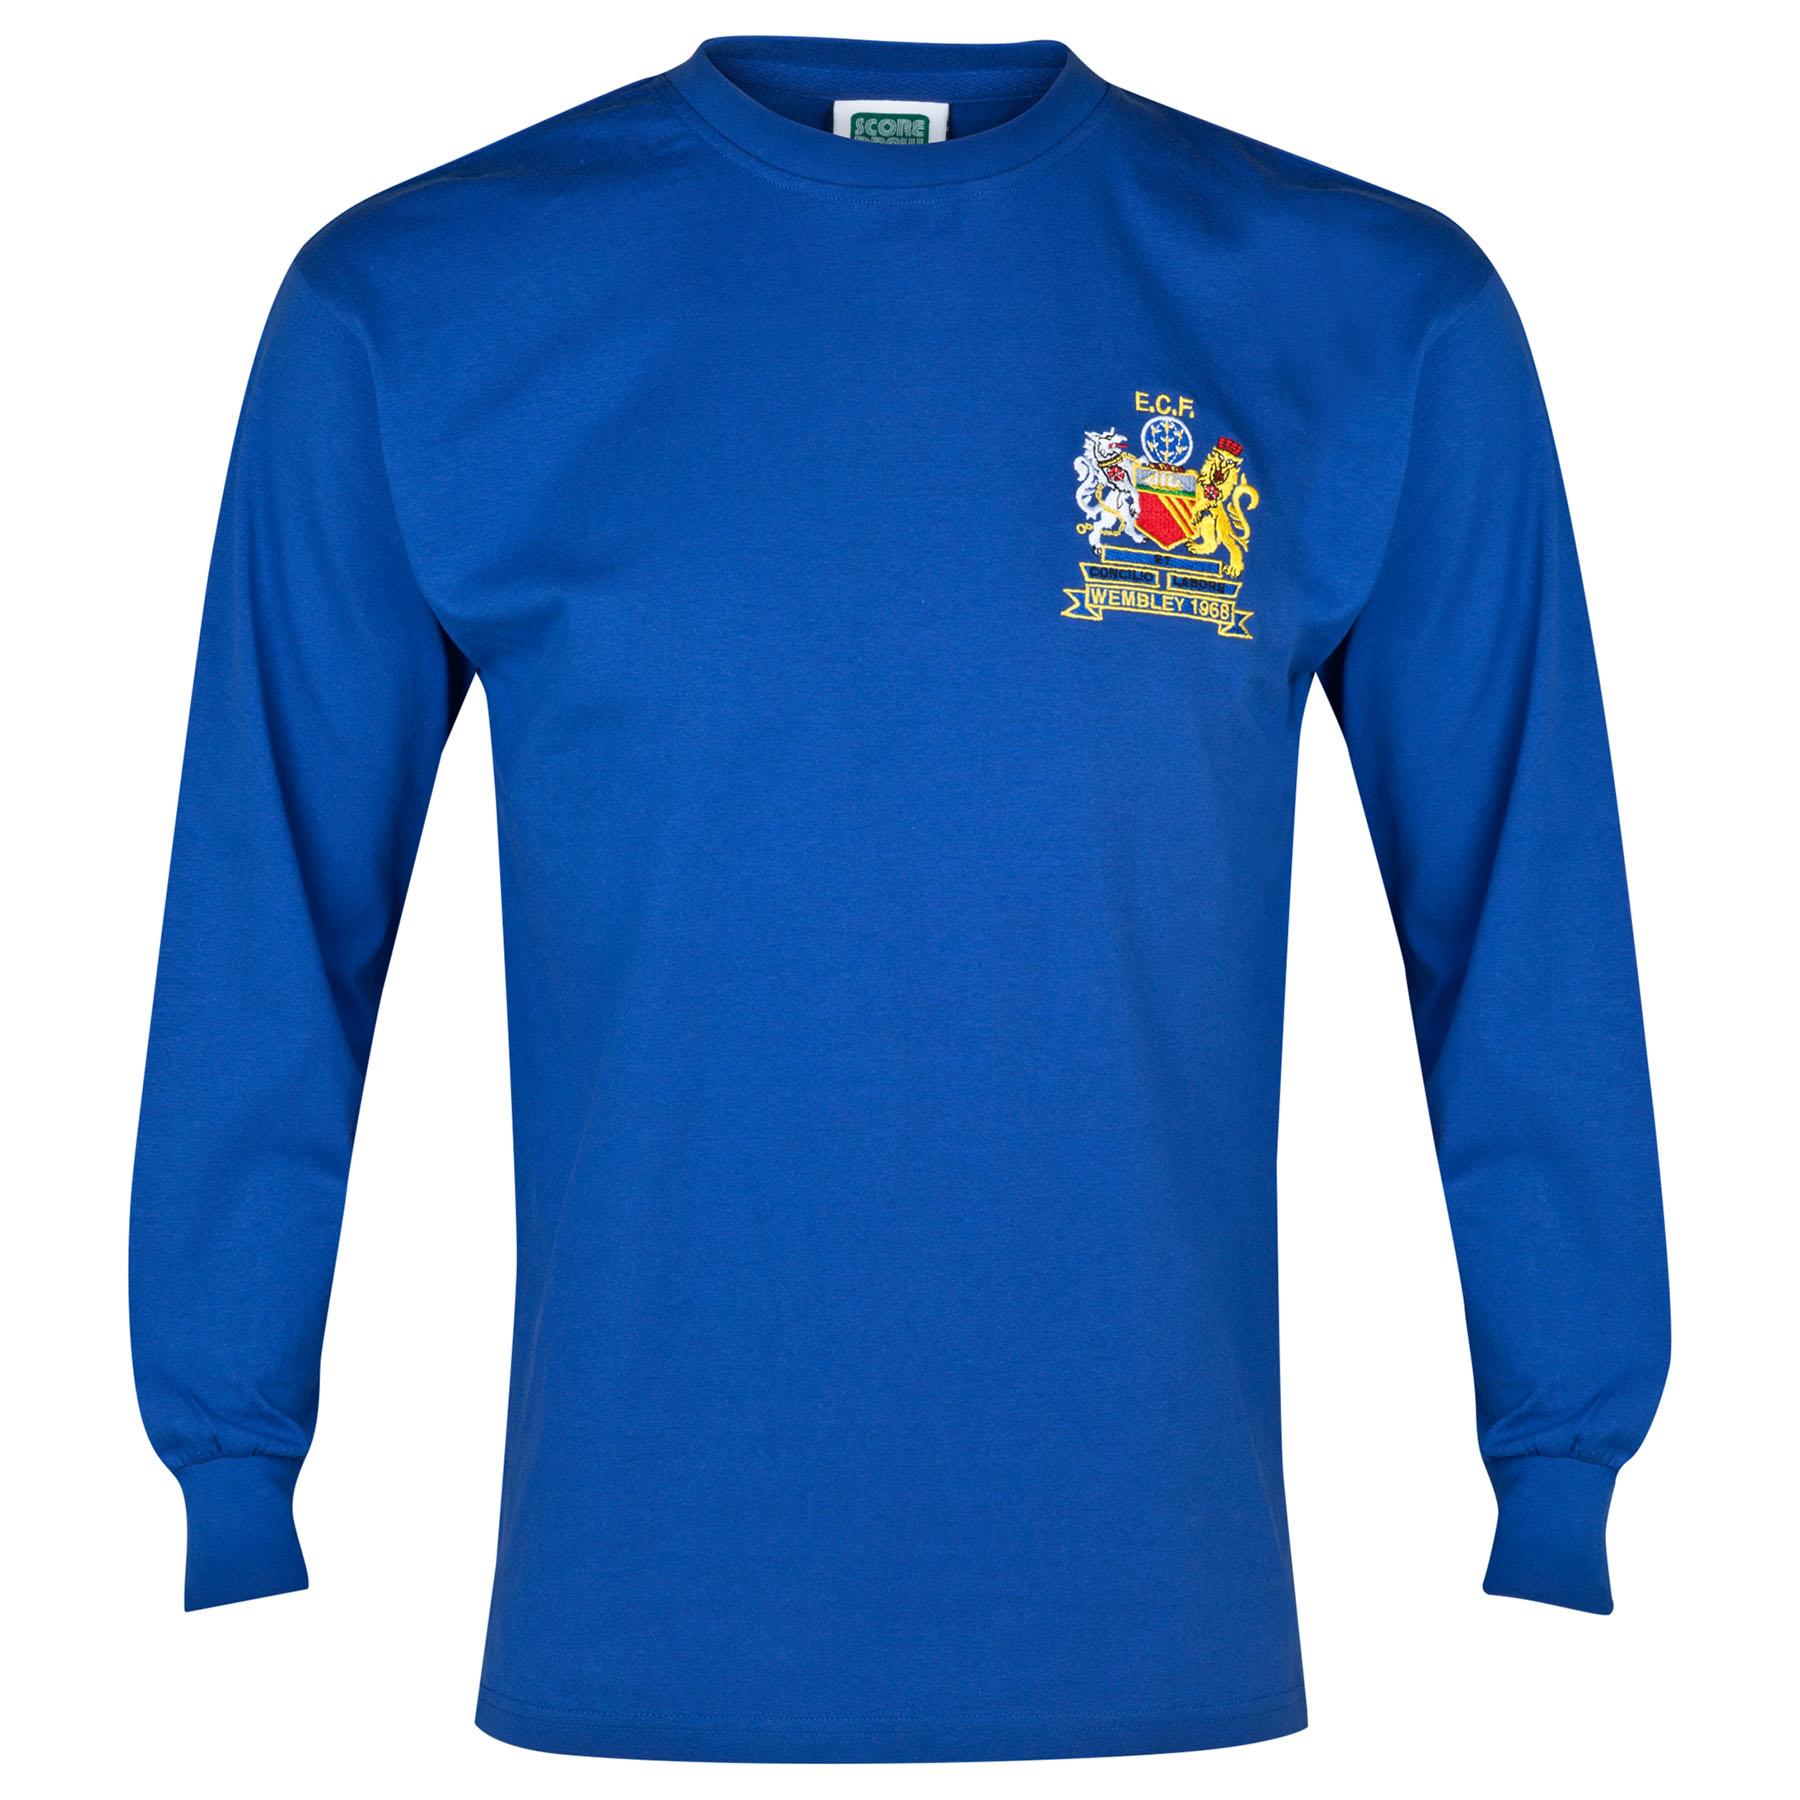 Manchester United 1968 European Cup Final Retro Away Shirt